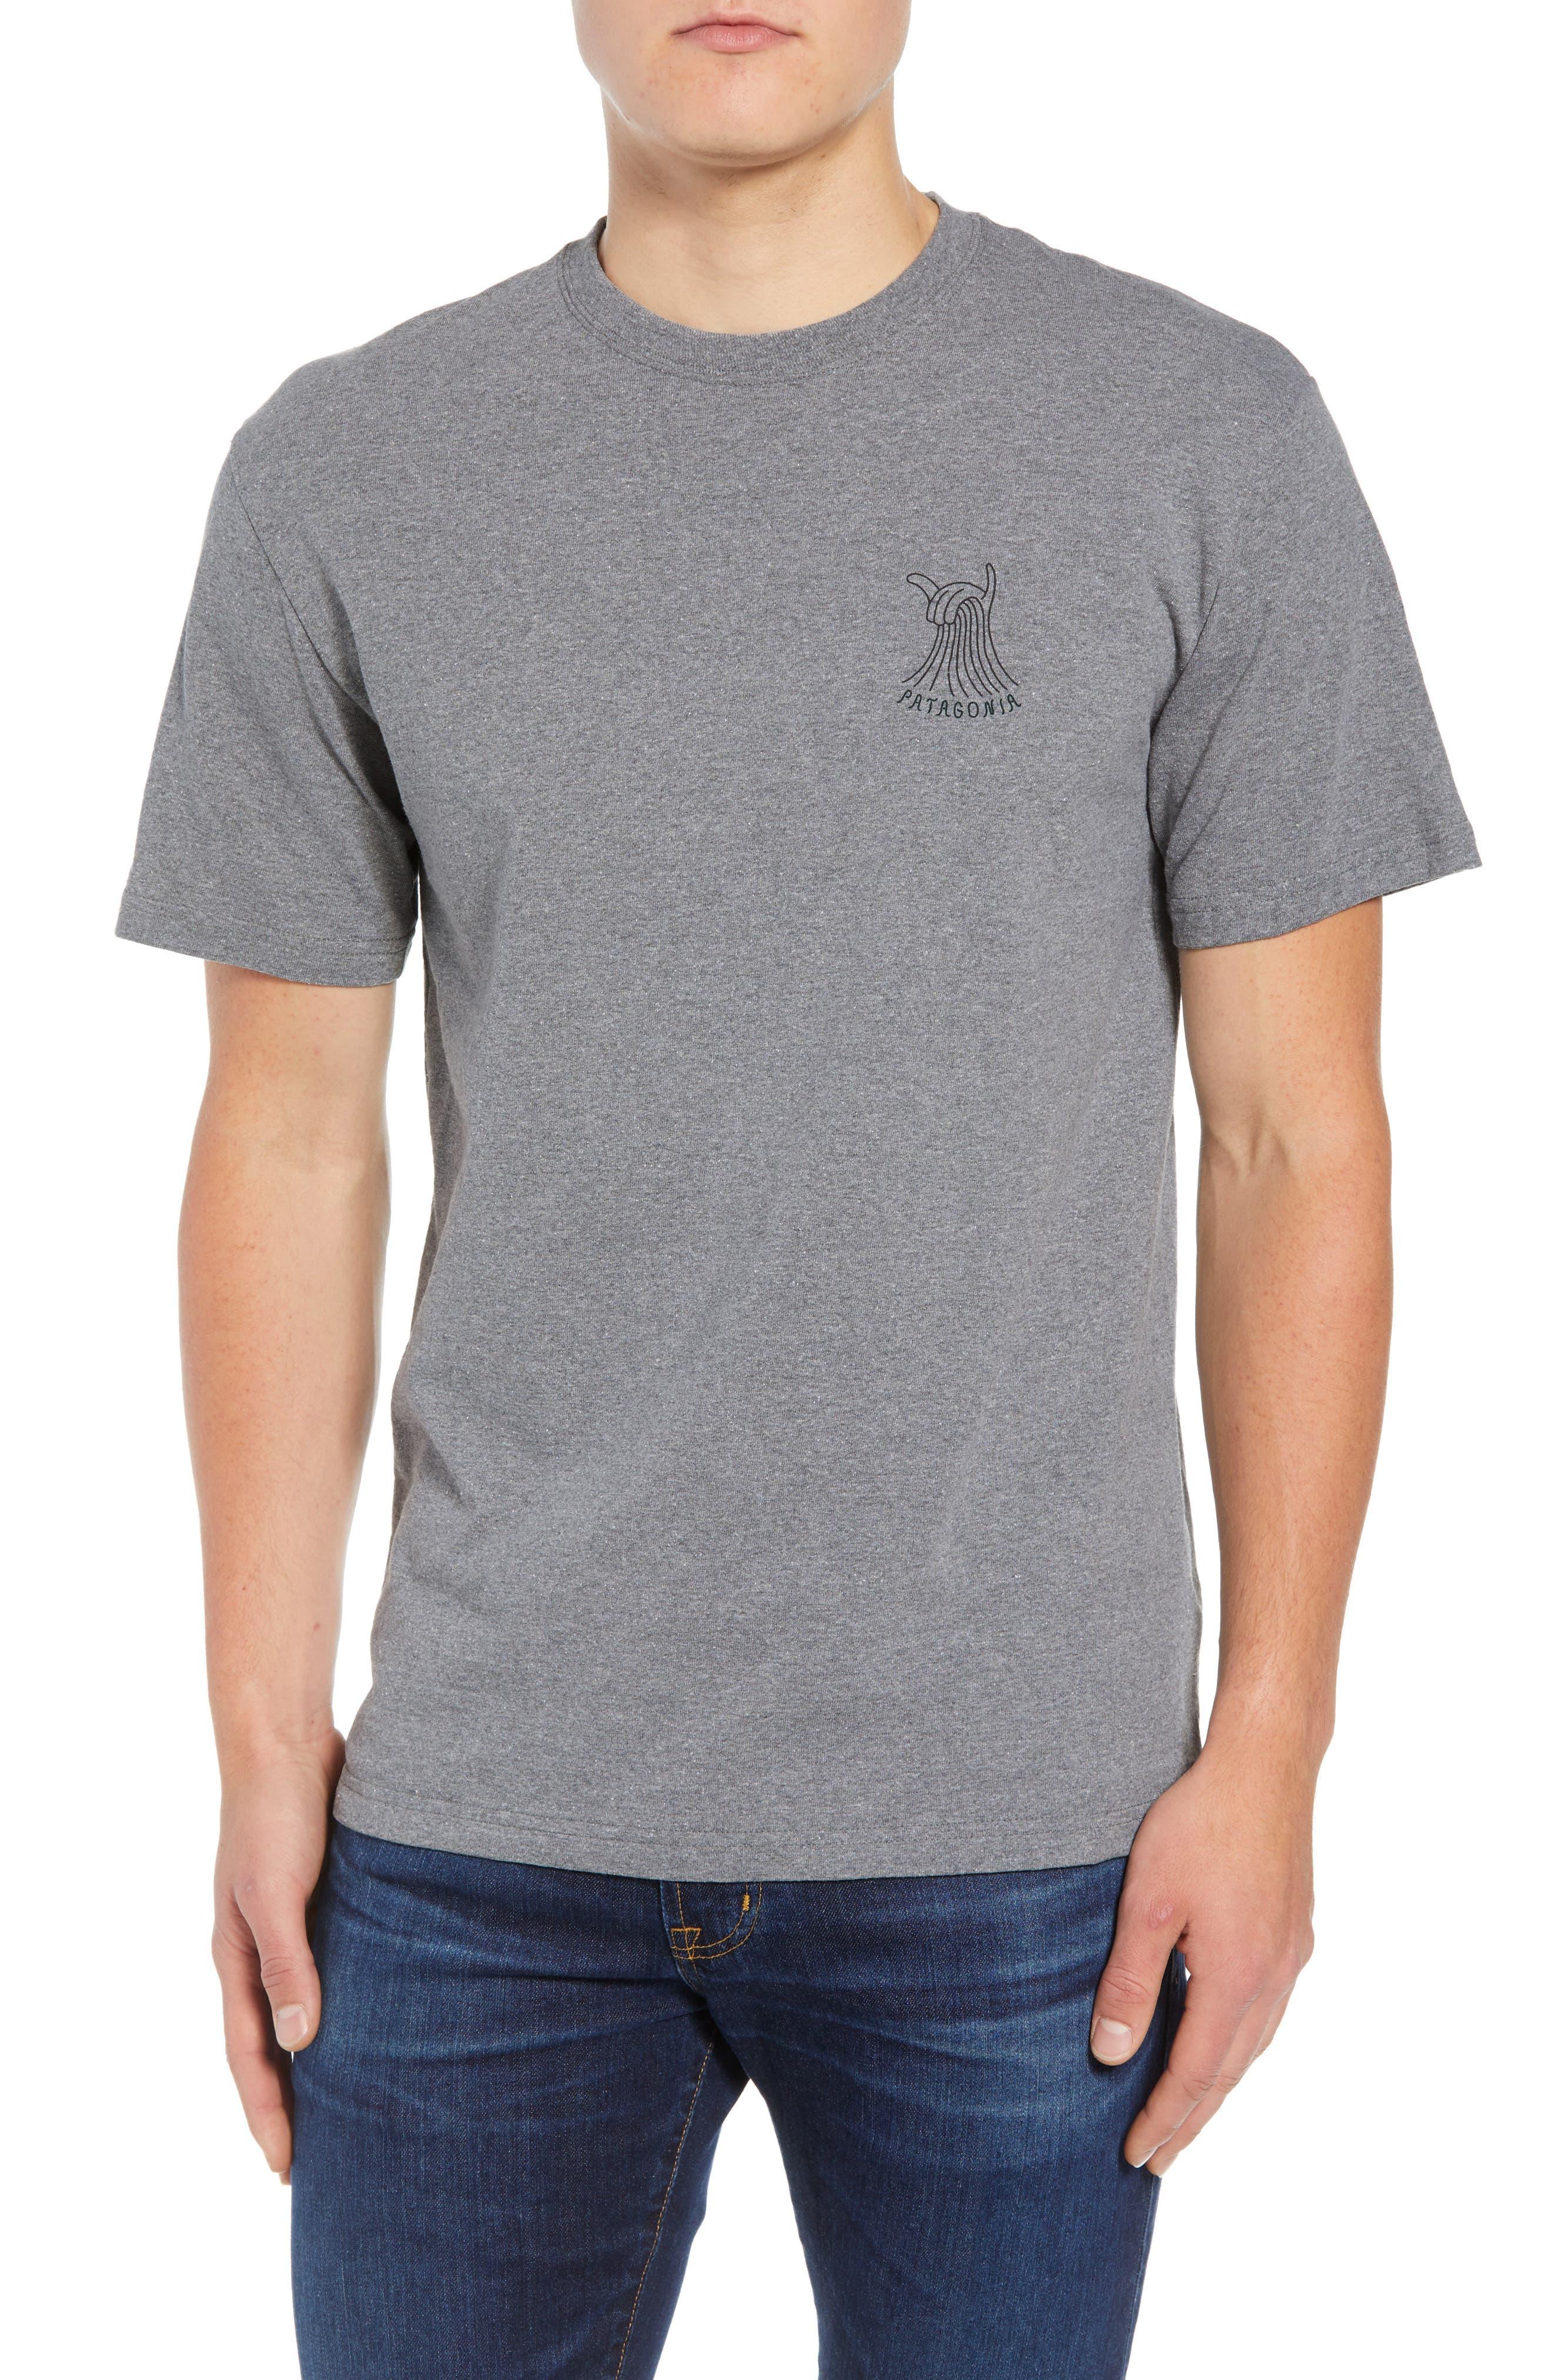 Shaka Wave Slim Fit T-Shirt,                         Main,                         color, GRAVEL HEATHER